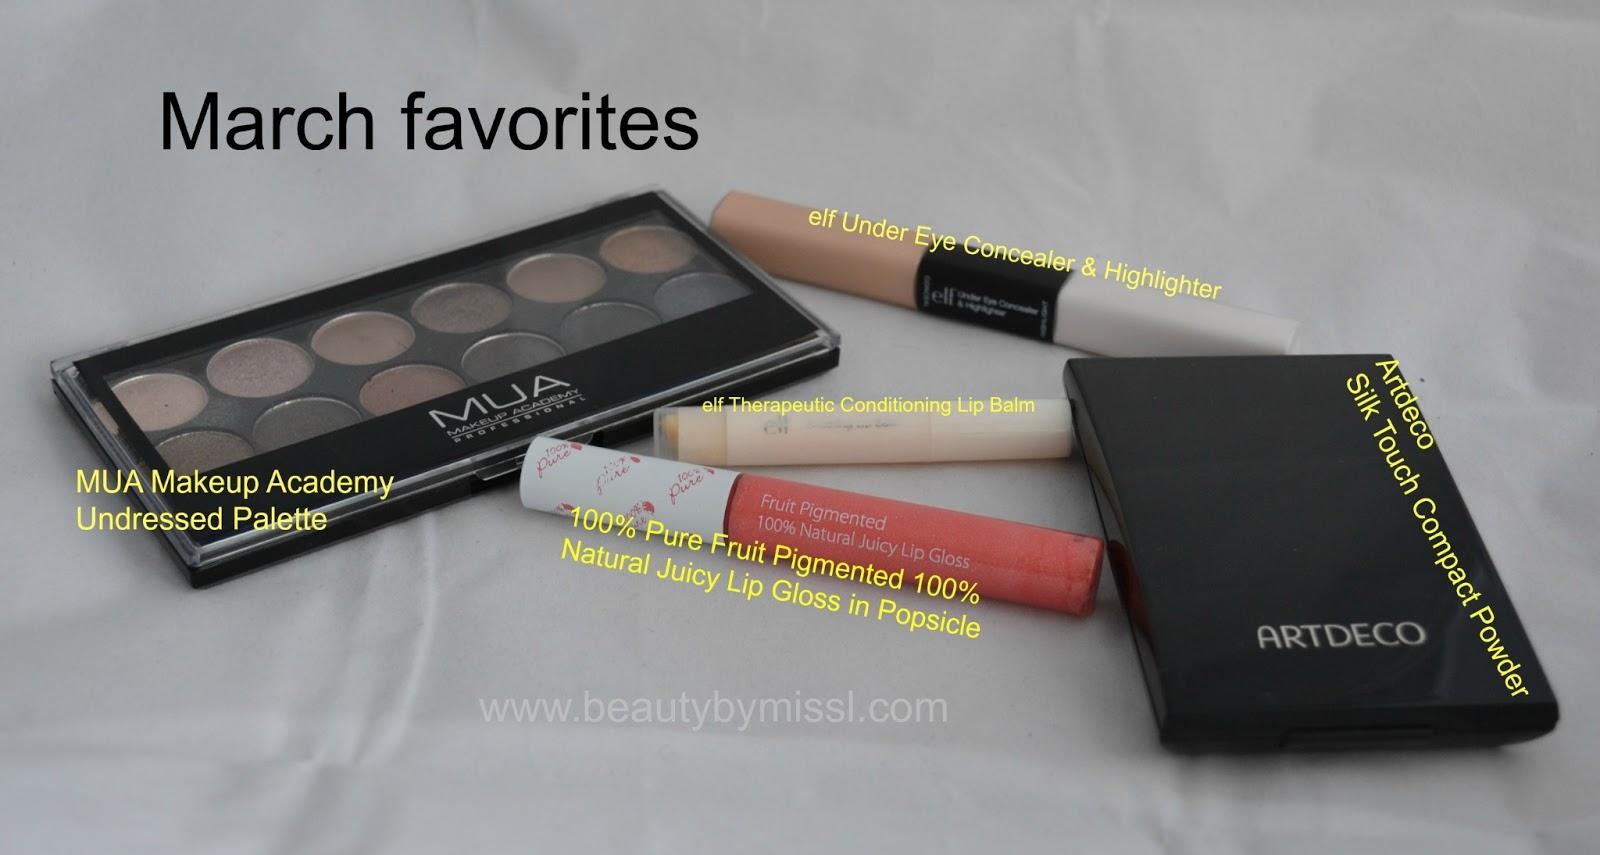 mua undressed palette, 100% pure lipgloss, artdeco powder,